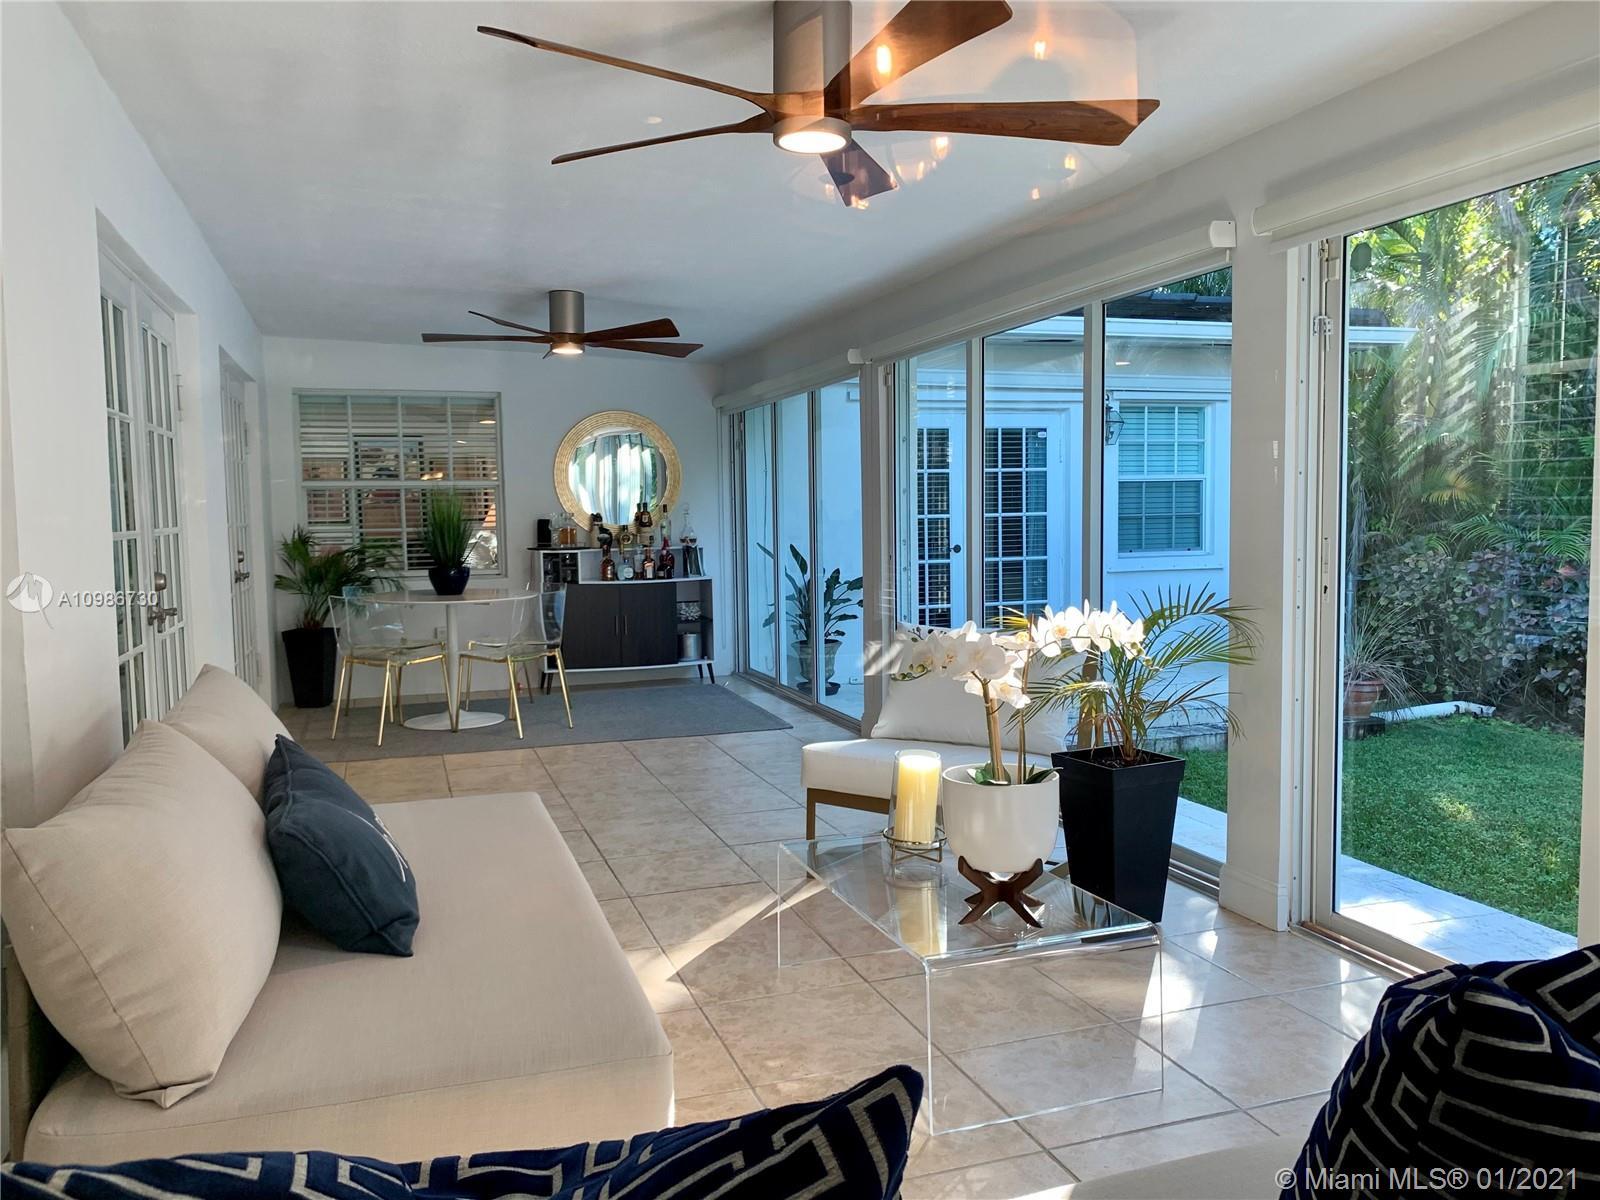 1540 Zoreta Ave, Coral Gables, Florida 33146, 3 Bedrooms Bedrooms, ,3 BathroomsBathrooms,Residential,For Sale,1540 Zoreta Ave,A10986730